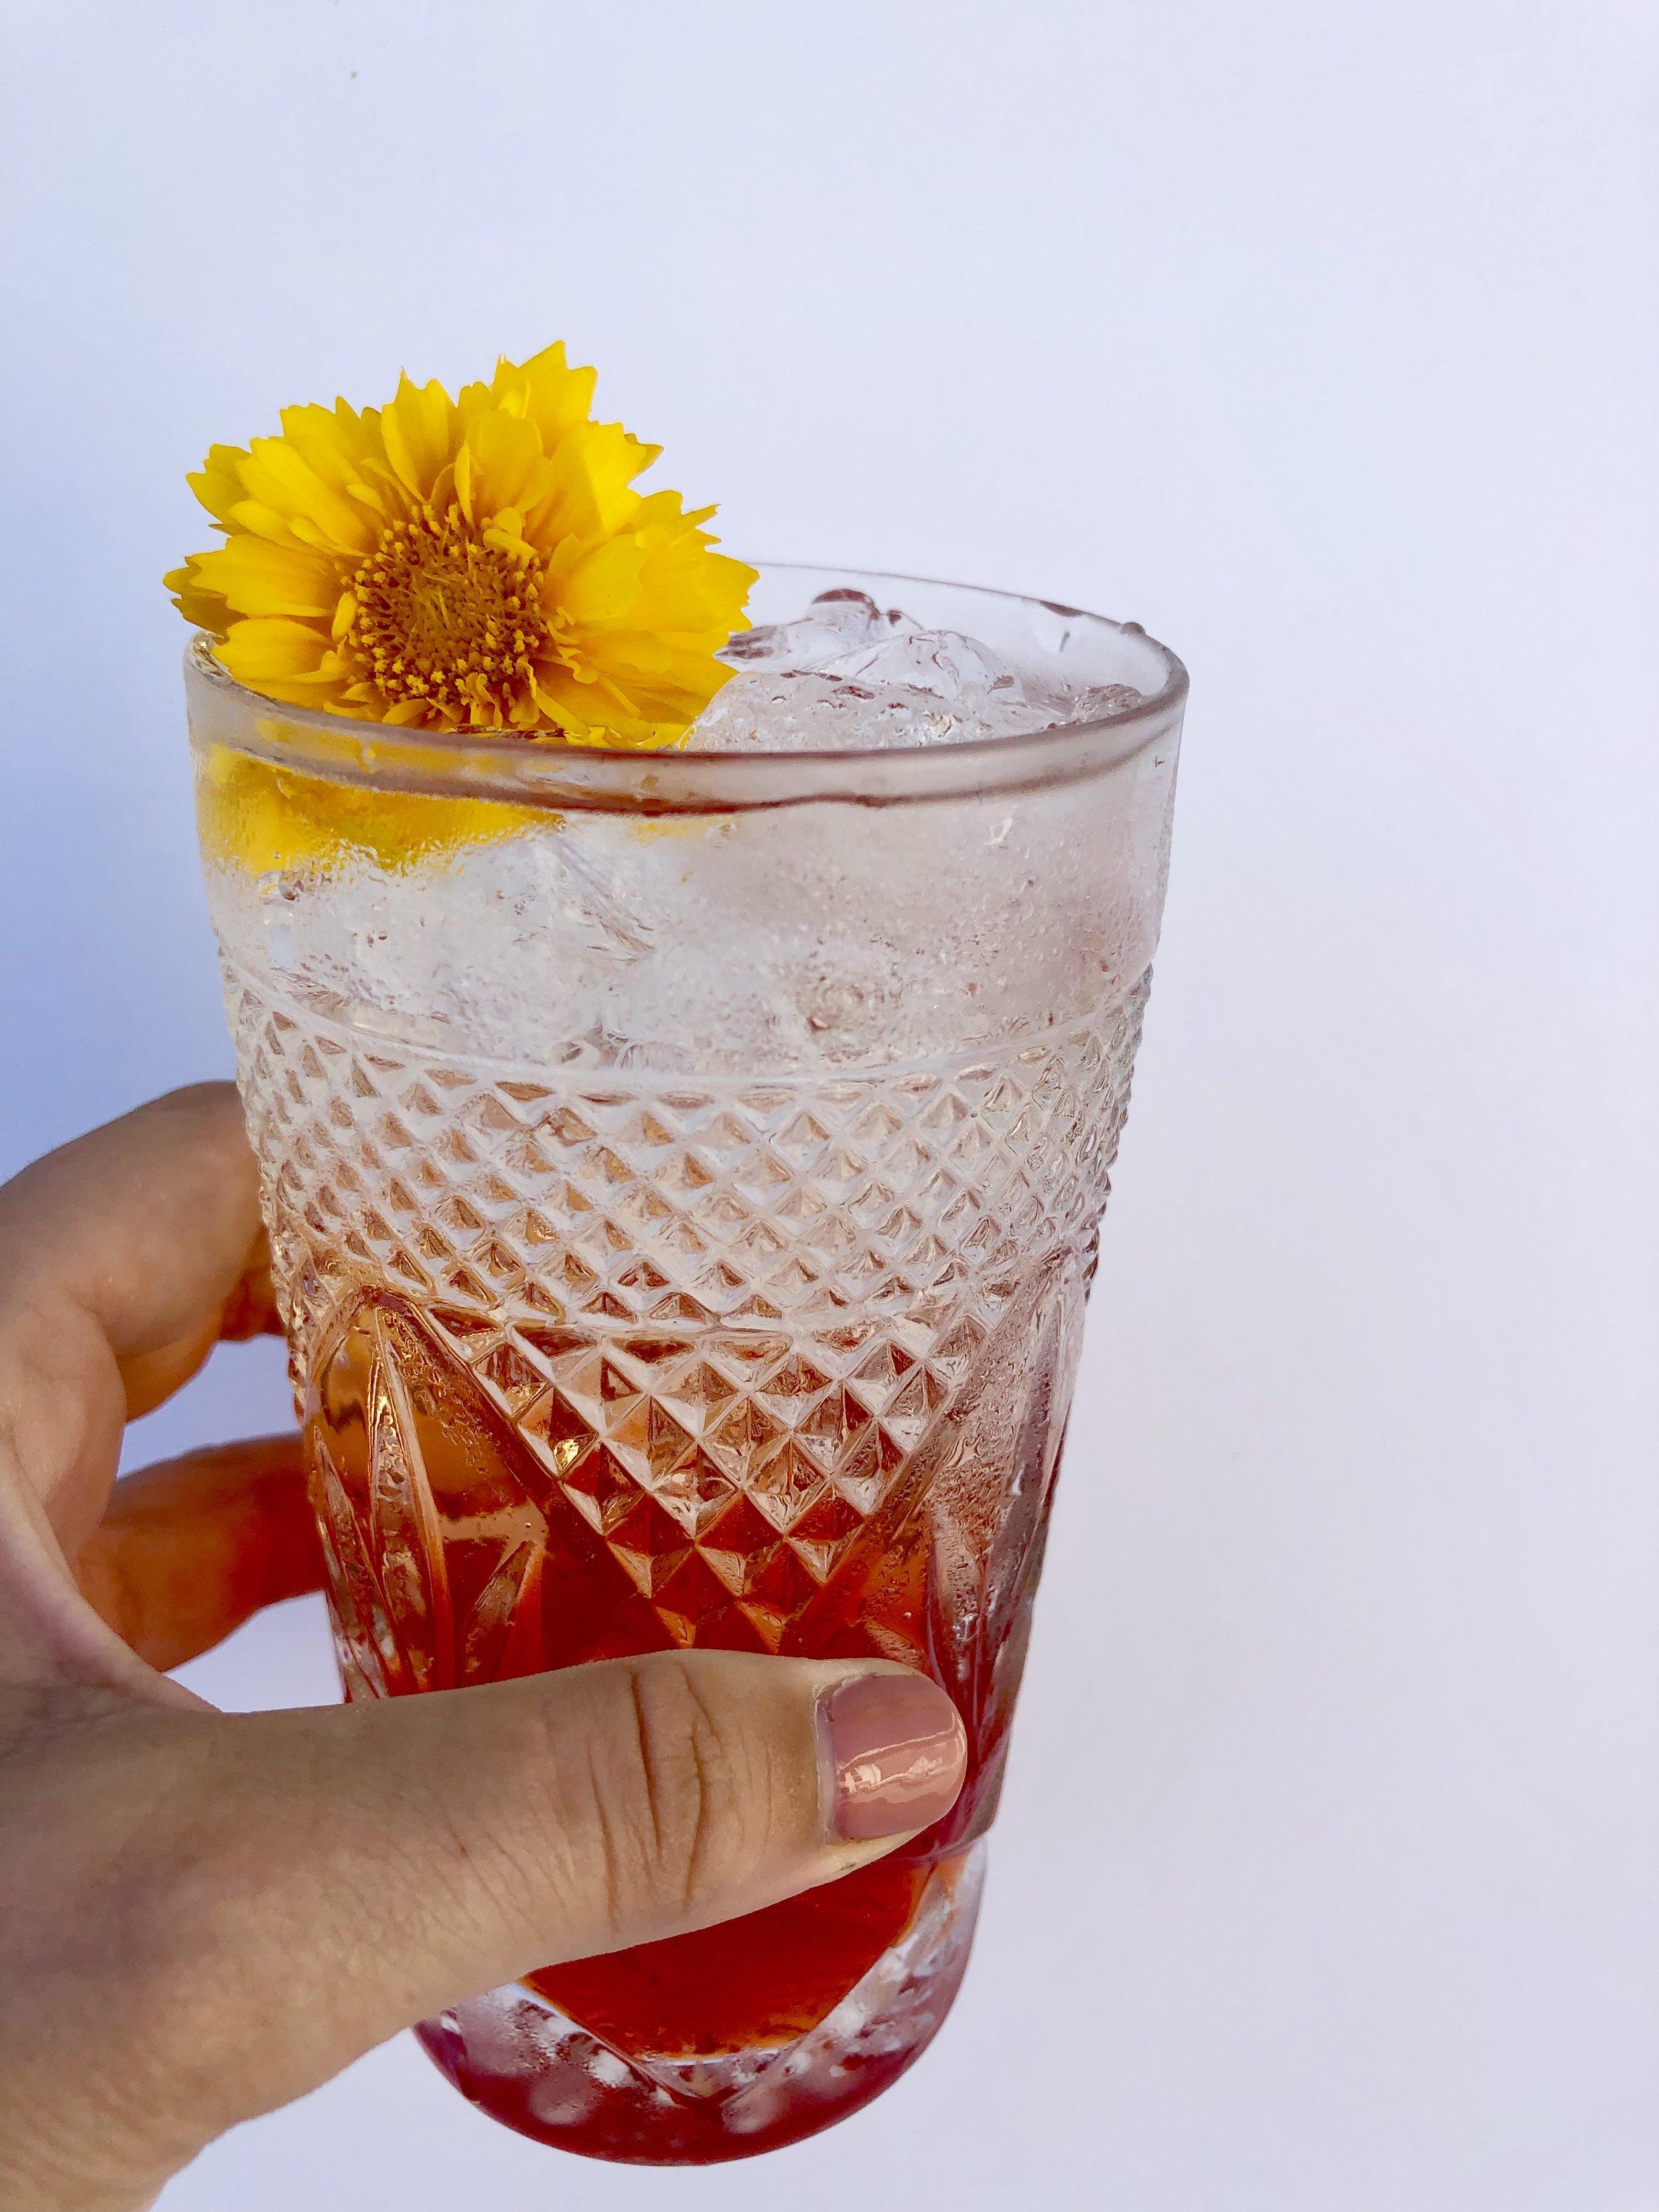 Sprig + Spritz! - A few sprigs of mint2 slices fresh Peach1 oz Aperol2 oz Blackberry KombuchaTop with Sparkling Brut Wine!